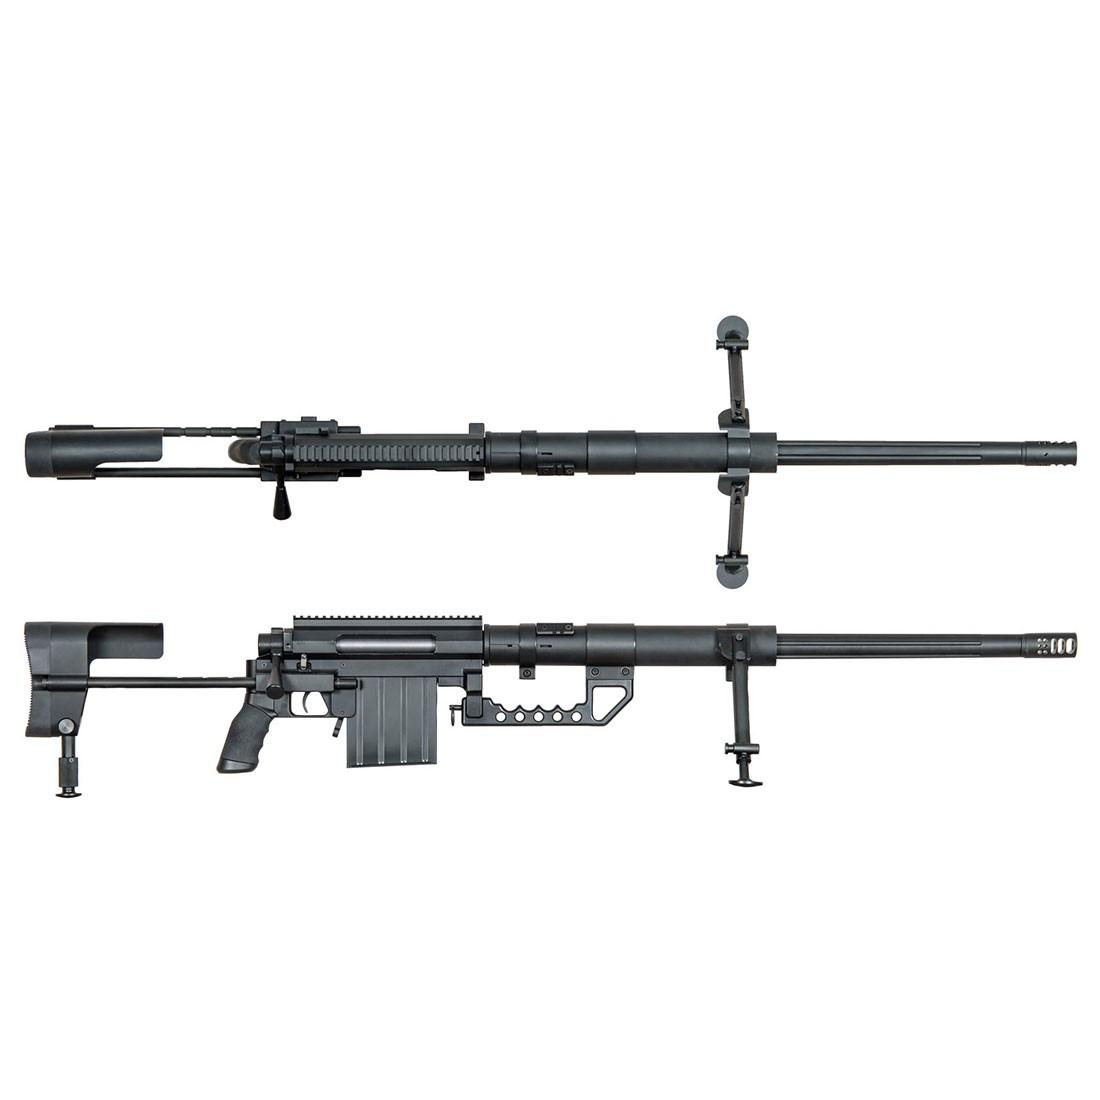 Ares Cheytac M200 Spring Sniper Rifle Tan